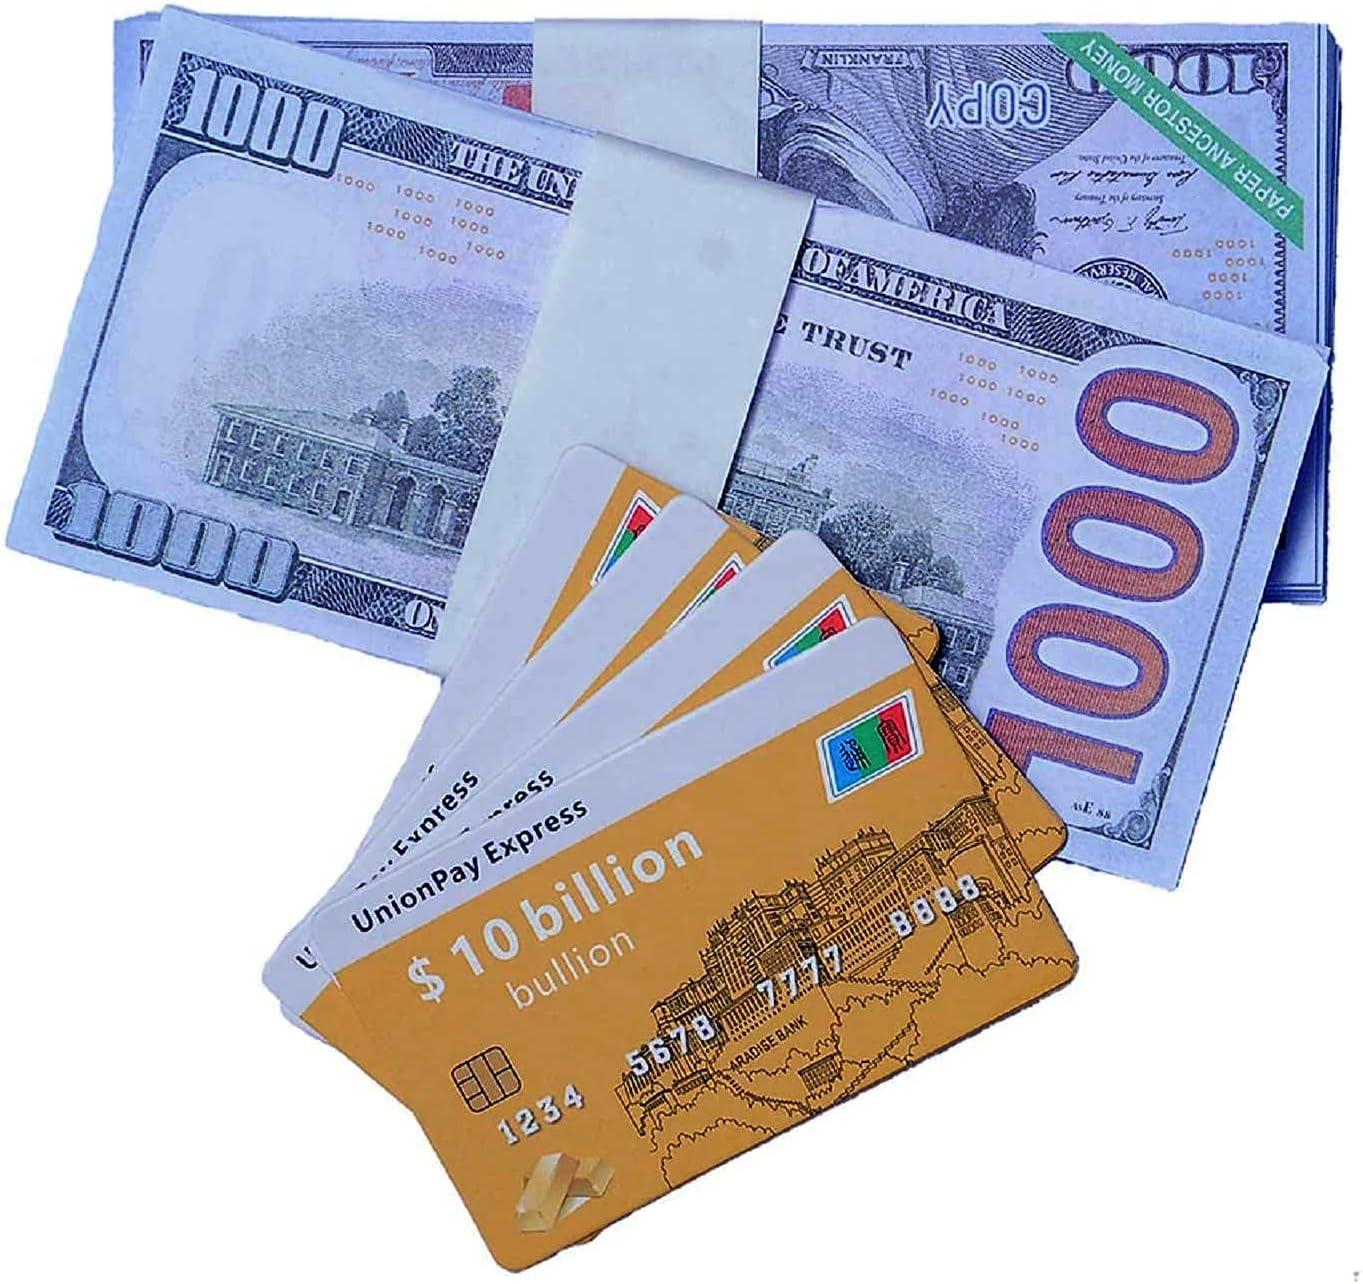 Ancestor Money Popular brand in the world Credit Card 160 Paper Joss Financial sales sale Piece